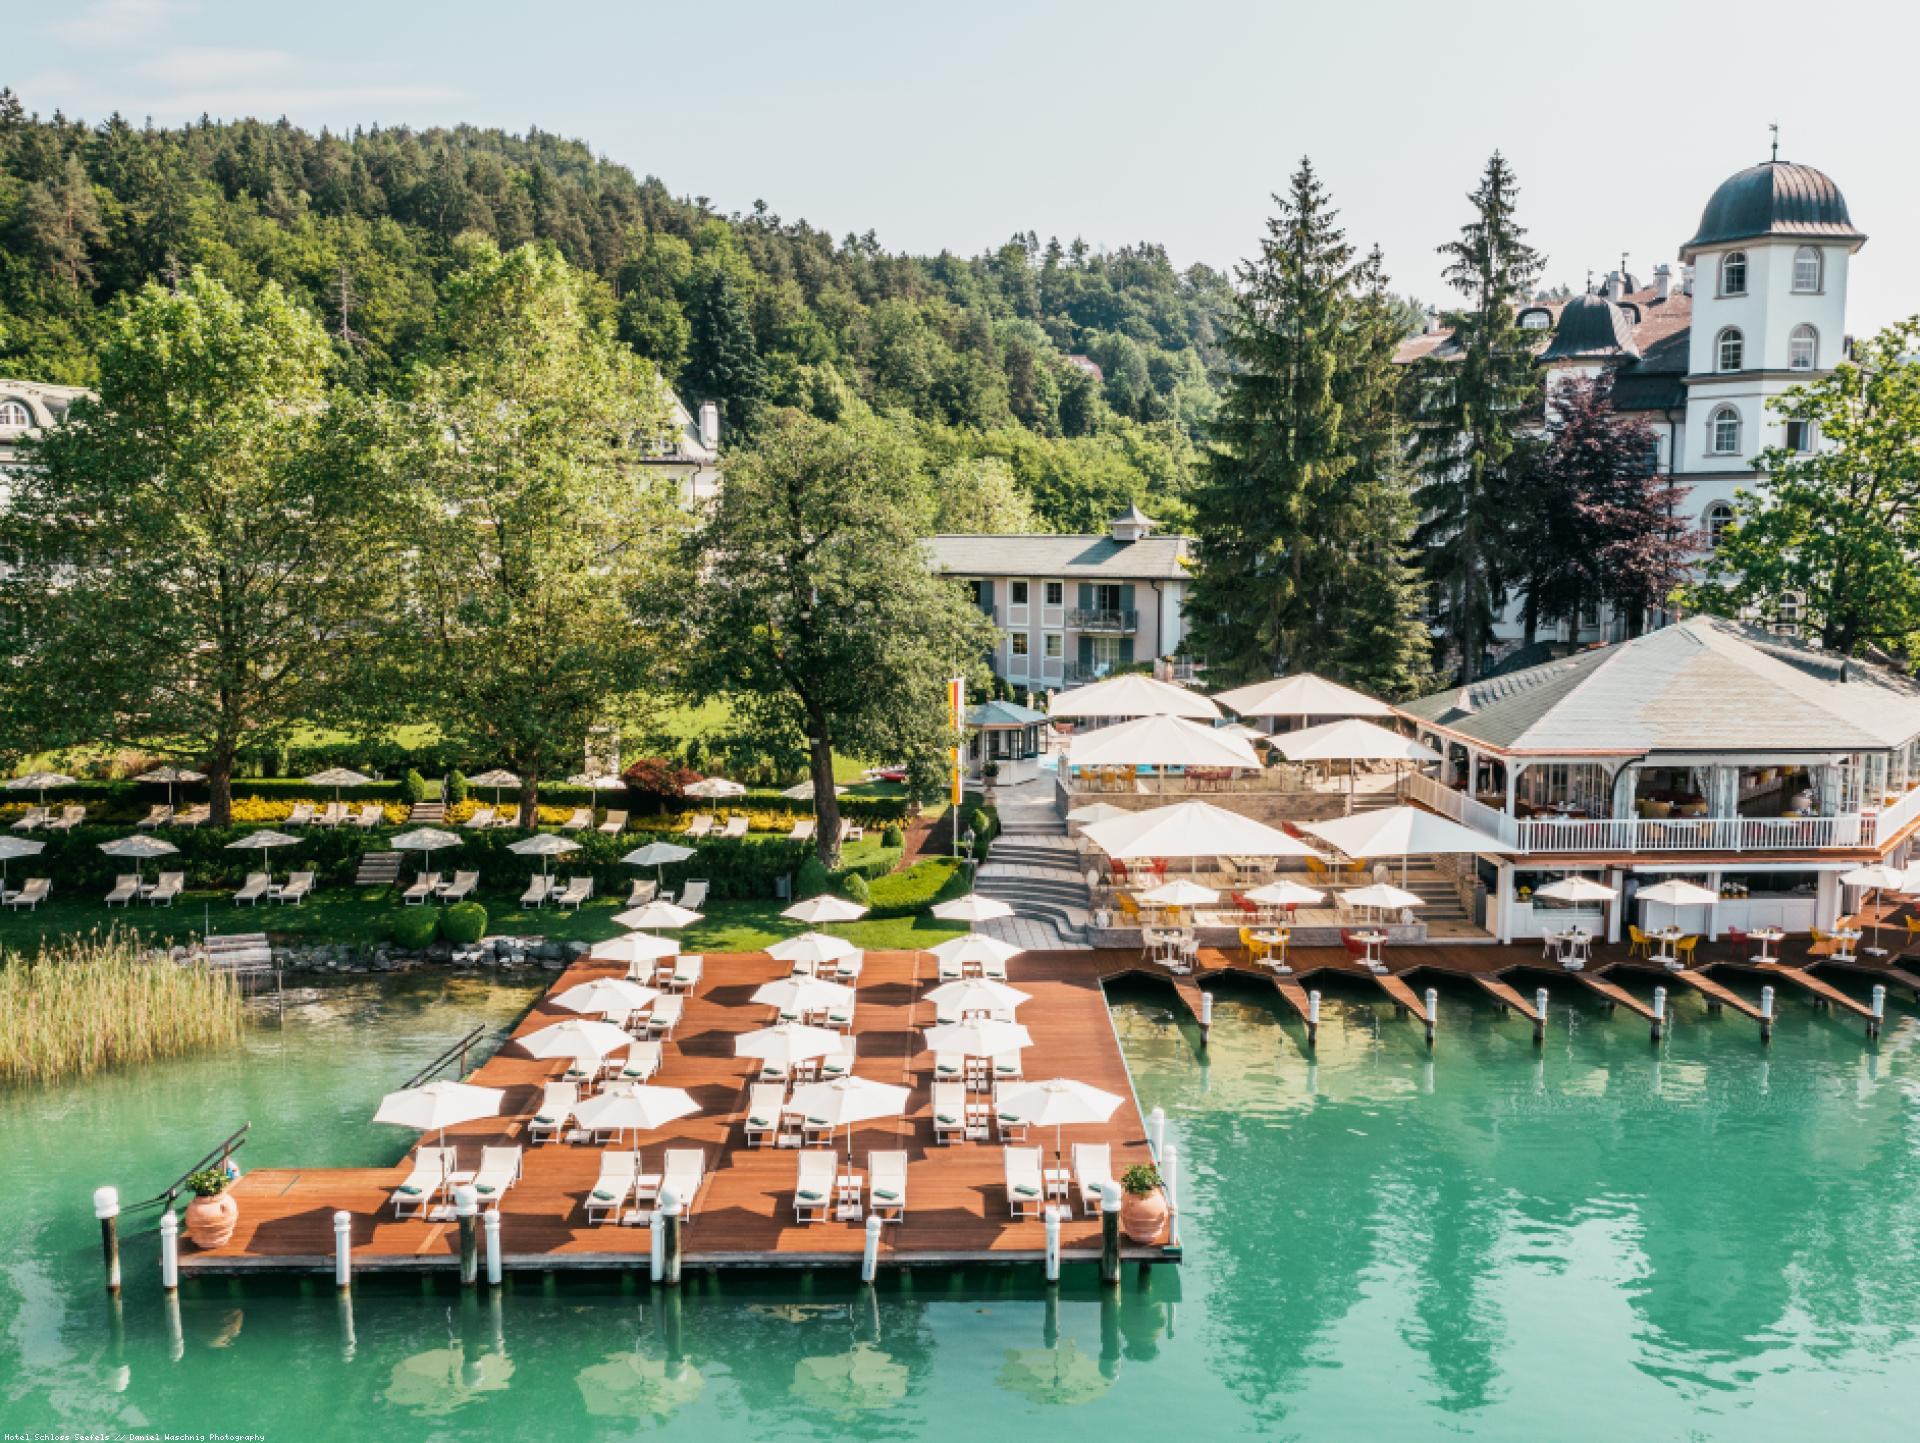 Mood-Image ELIN Referenz: Hotel Schloss Seefels, Seerestaurant Porto bello